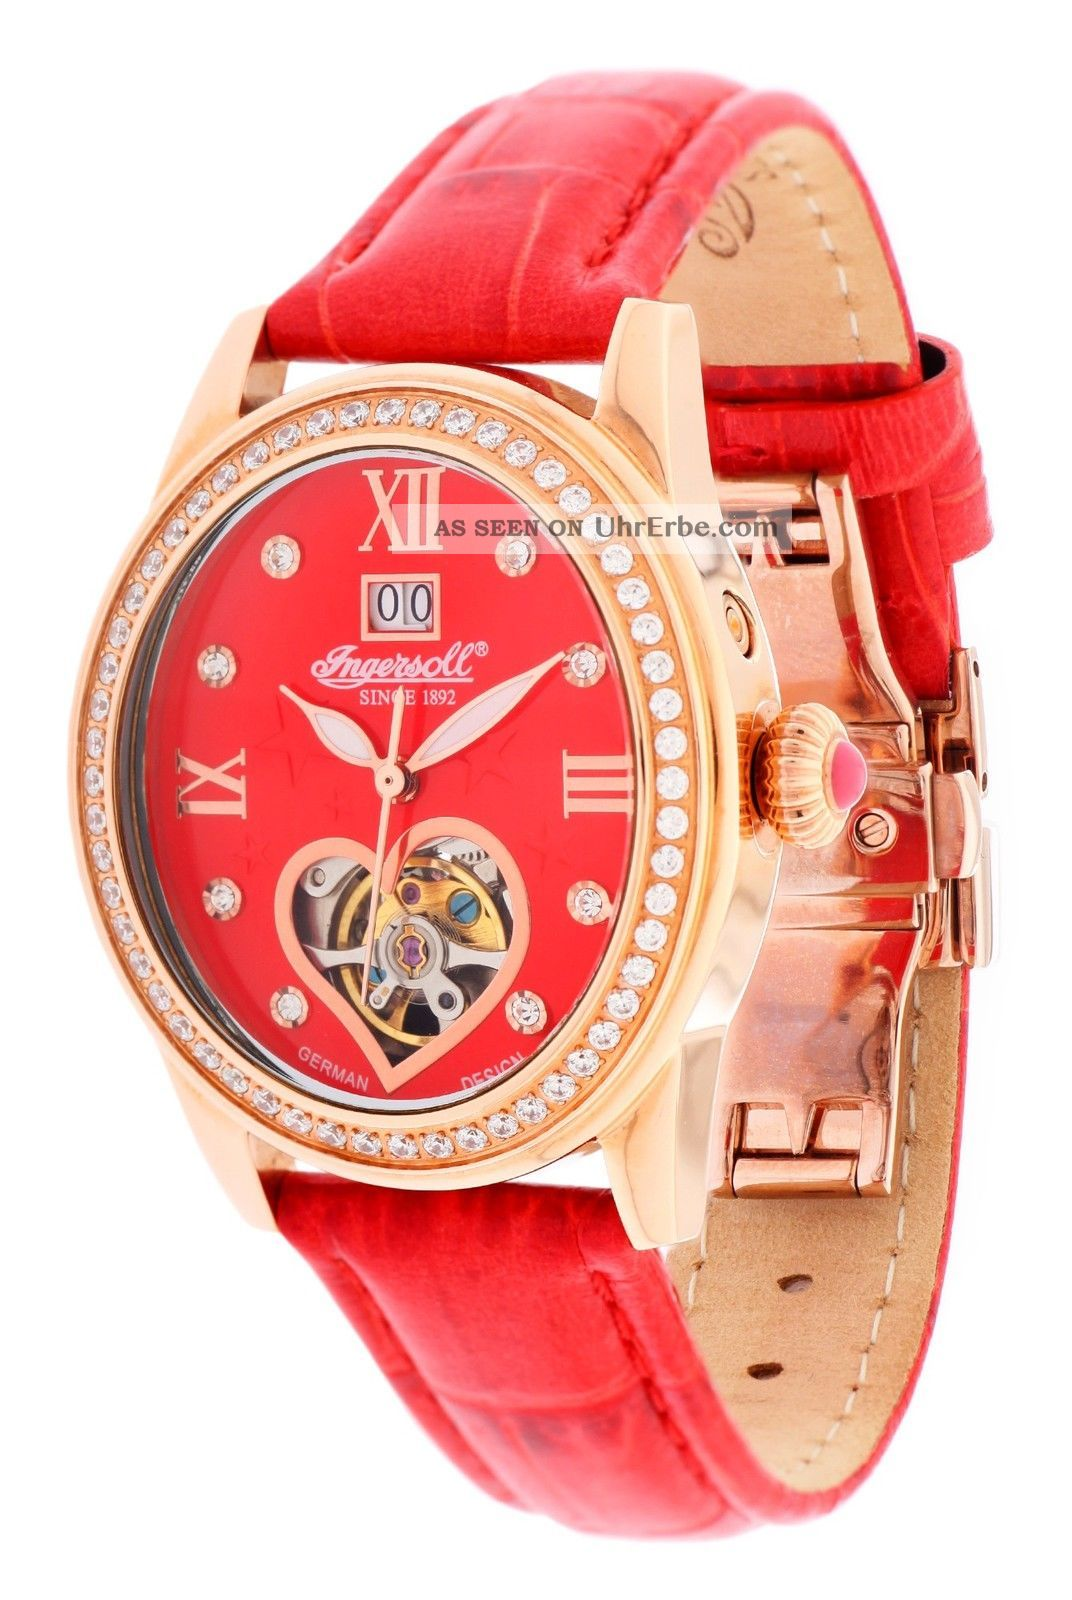 Ingersoll Damen Armbanduhr Punca Limited Edition Rot In5011rrd Armbanduhren Bild